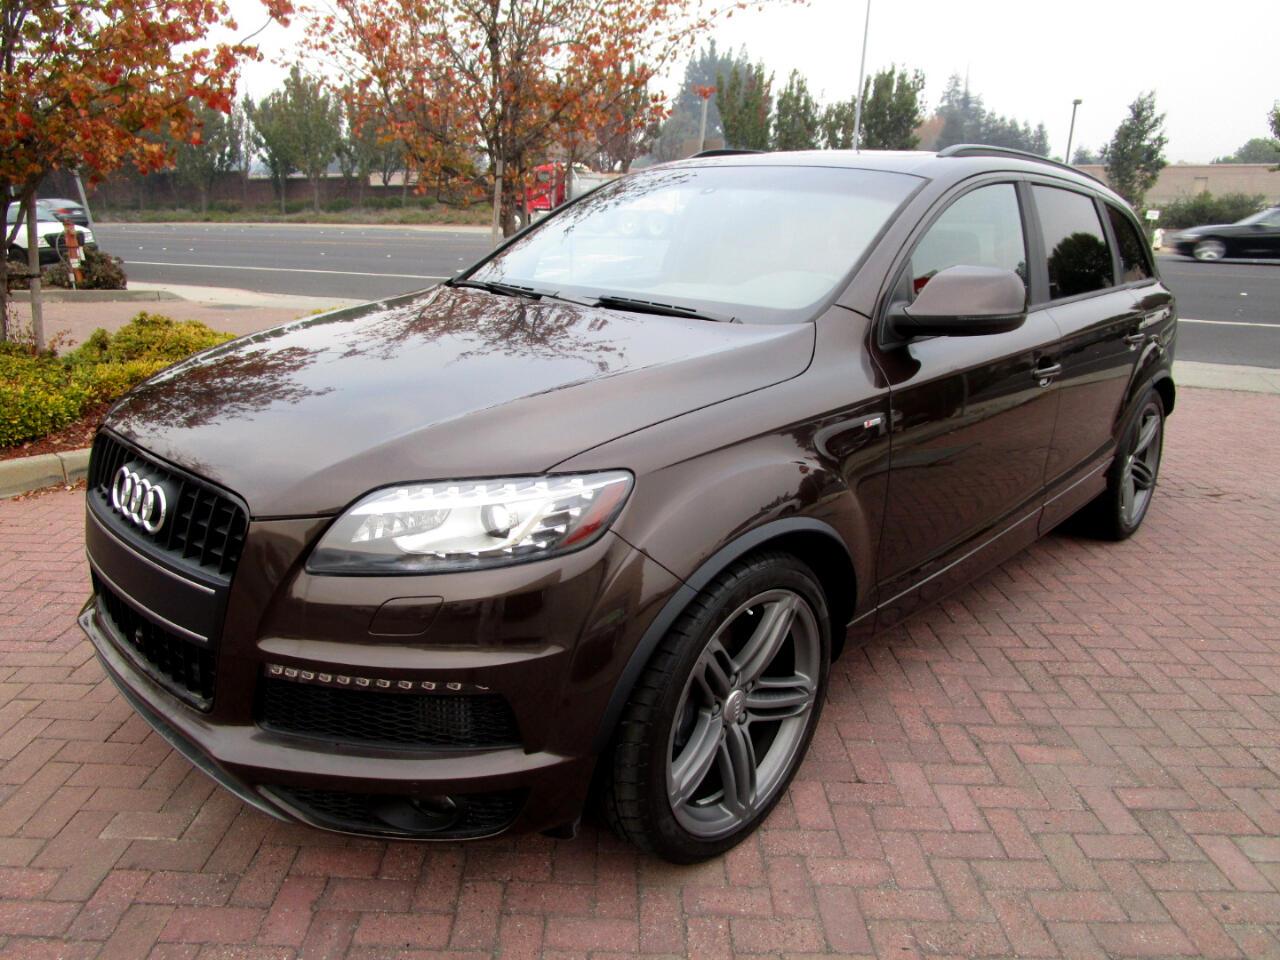 2015 Audi Q7 PRESIGE 3.0 DIESEL*ADPT SUSP*SLINE*LUX SEATS*PANO*